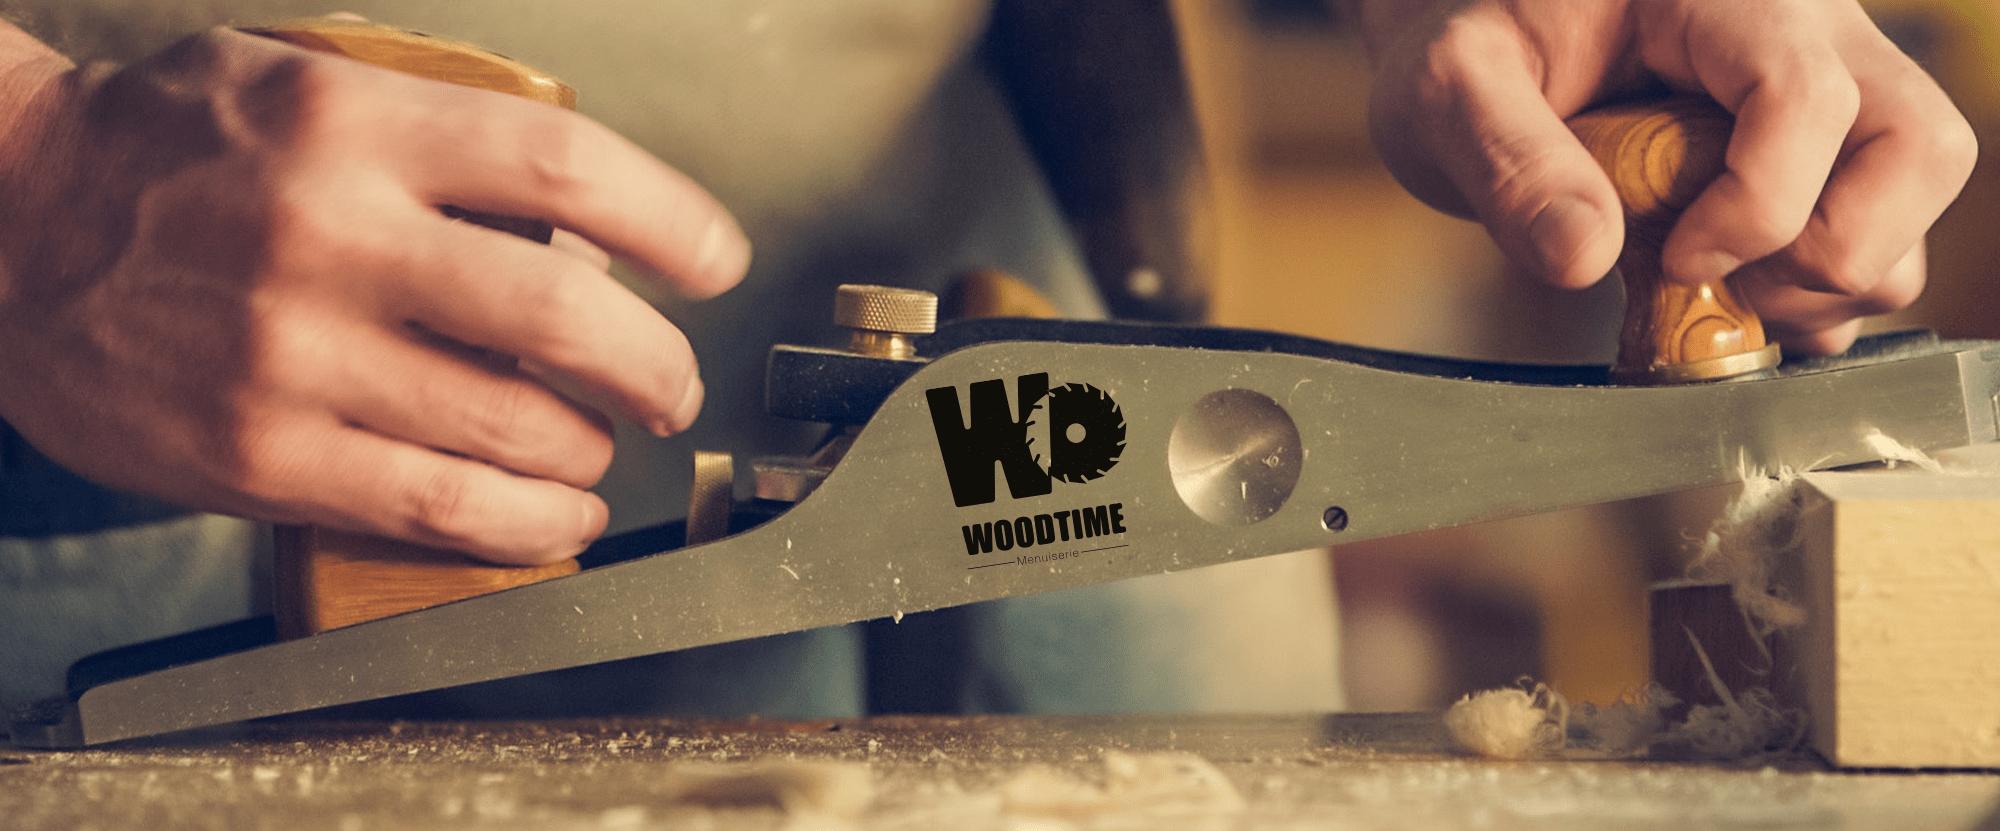 Bandeau Woodtime